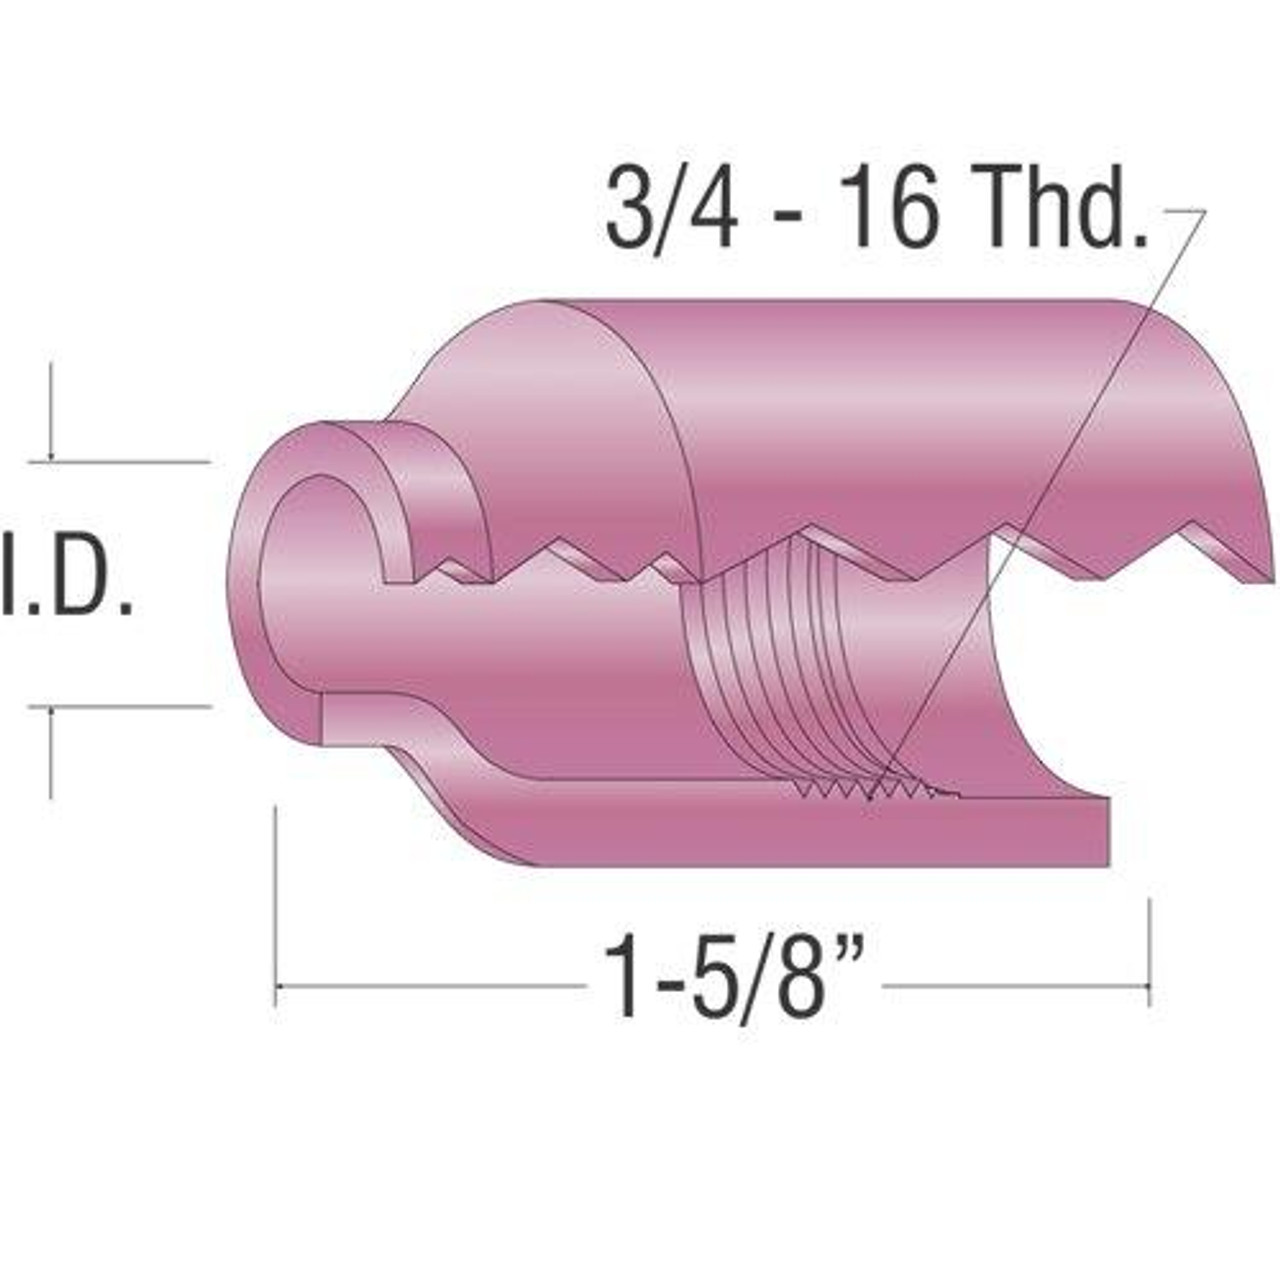 Profax 54N14 Alumina Cup 1/2 17-18-26 Series TIG Torch - 10 Pack